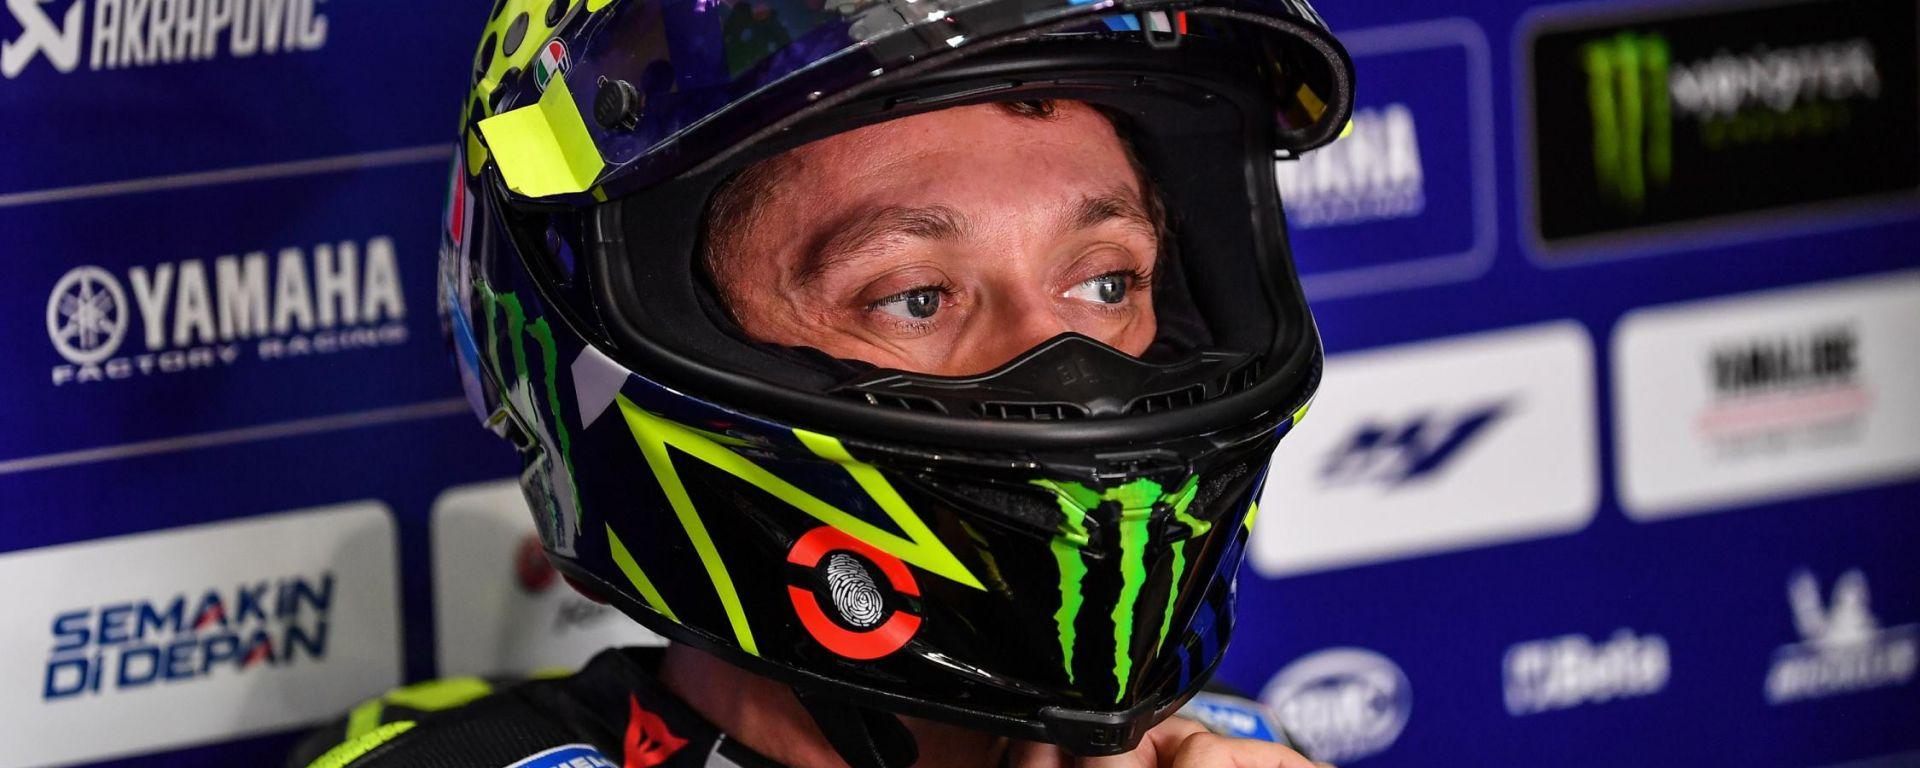 MotoGP Test Qatar 2020, Valentino Rossi (Yamaha)